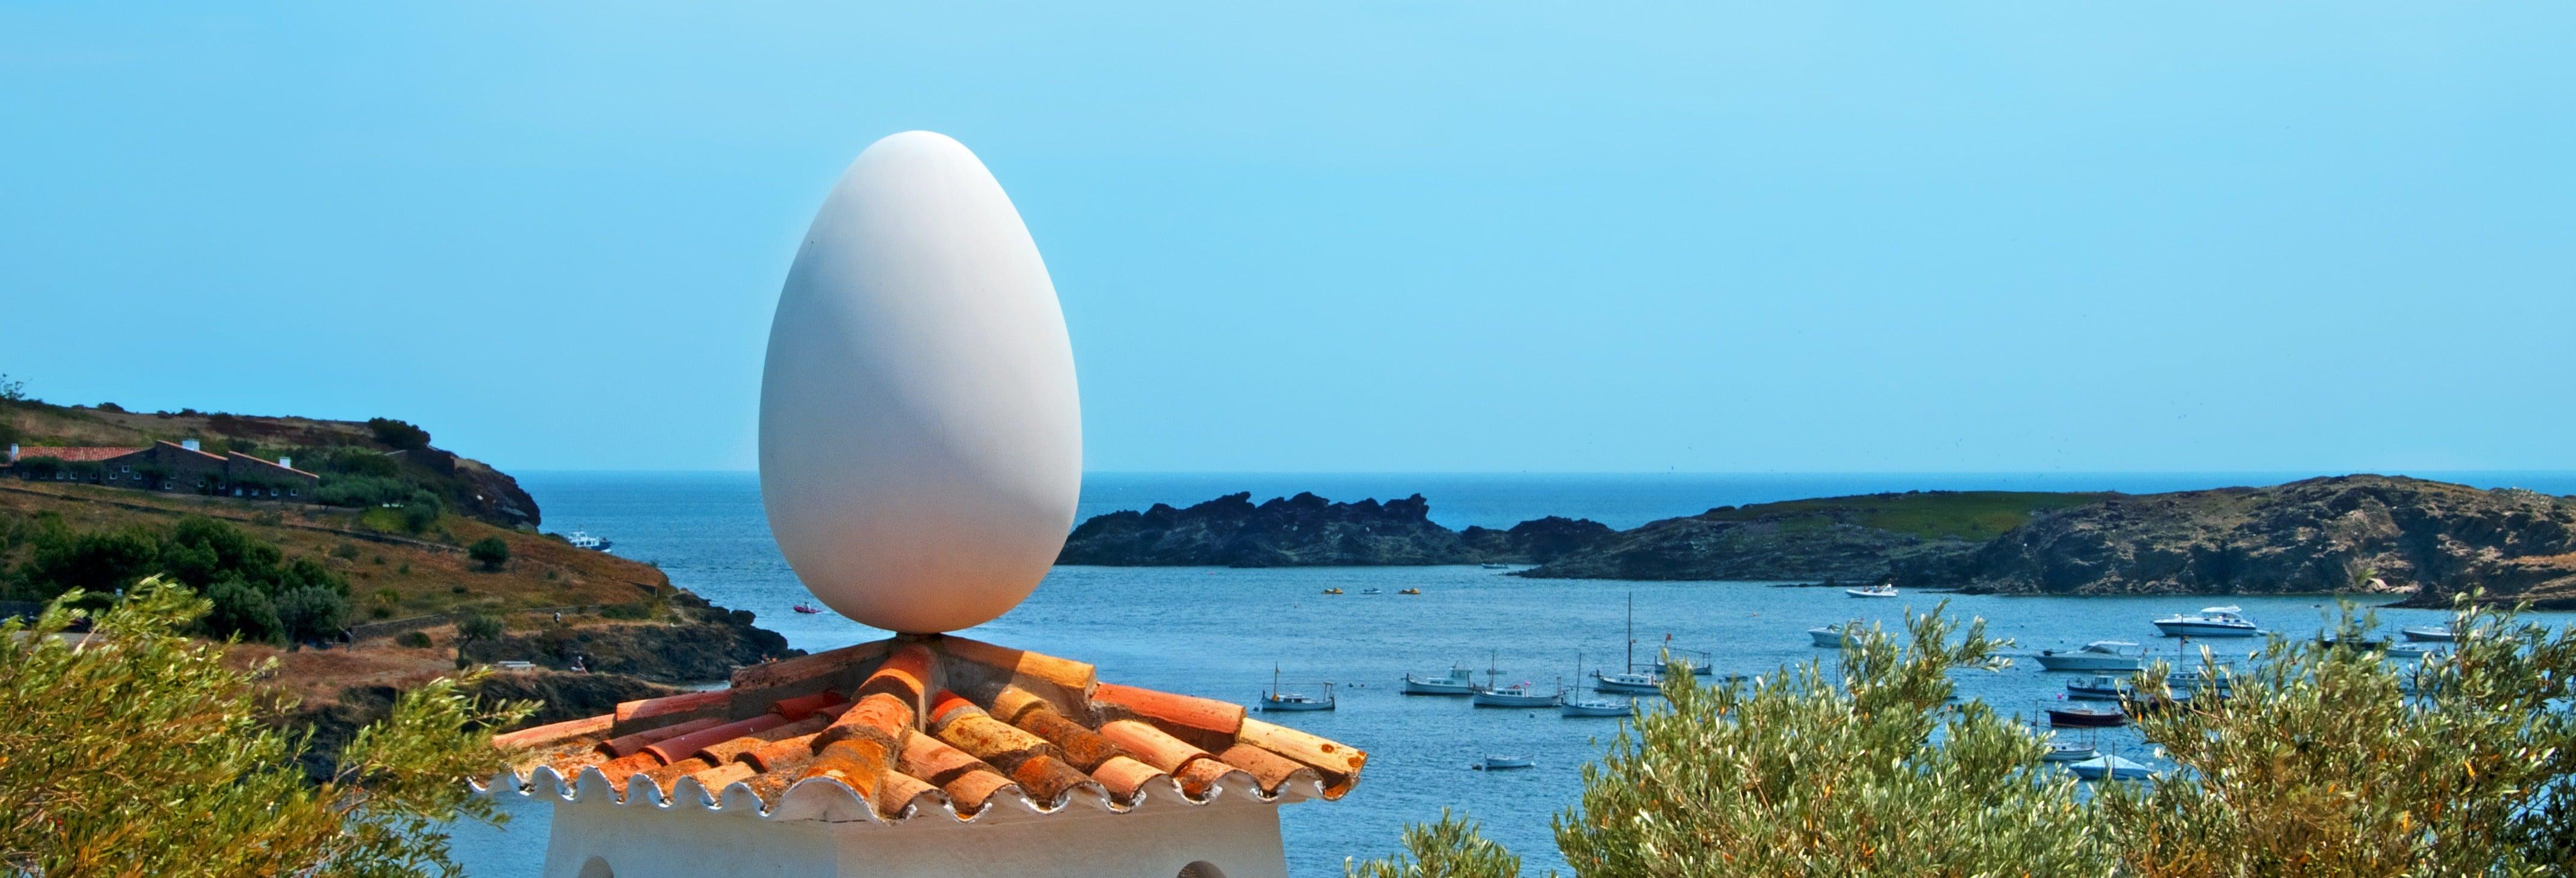 Tour di Dalí: Museo diFigueras, Cadaqués e Cap de Creus